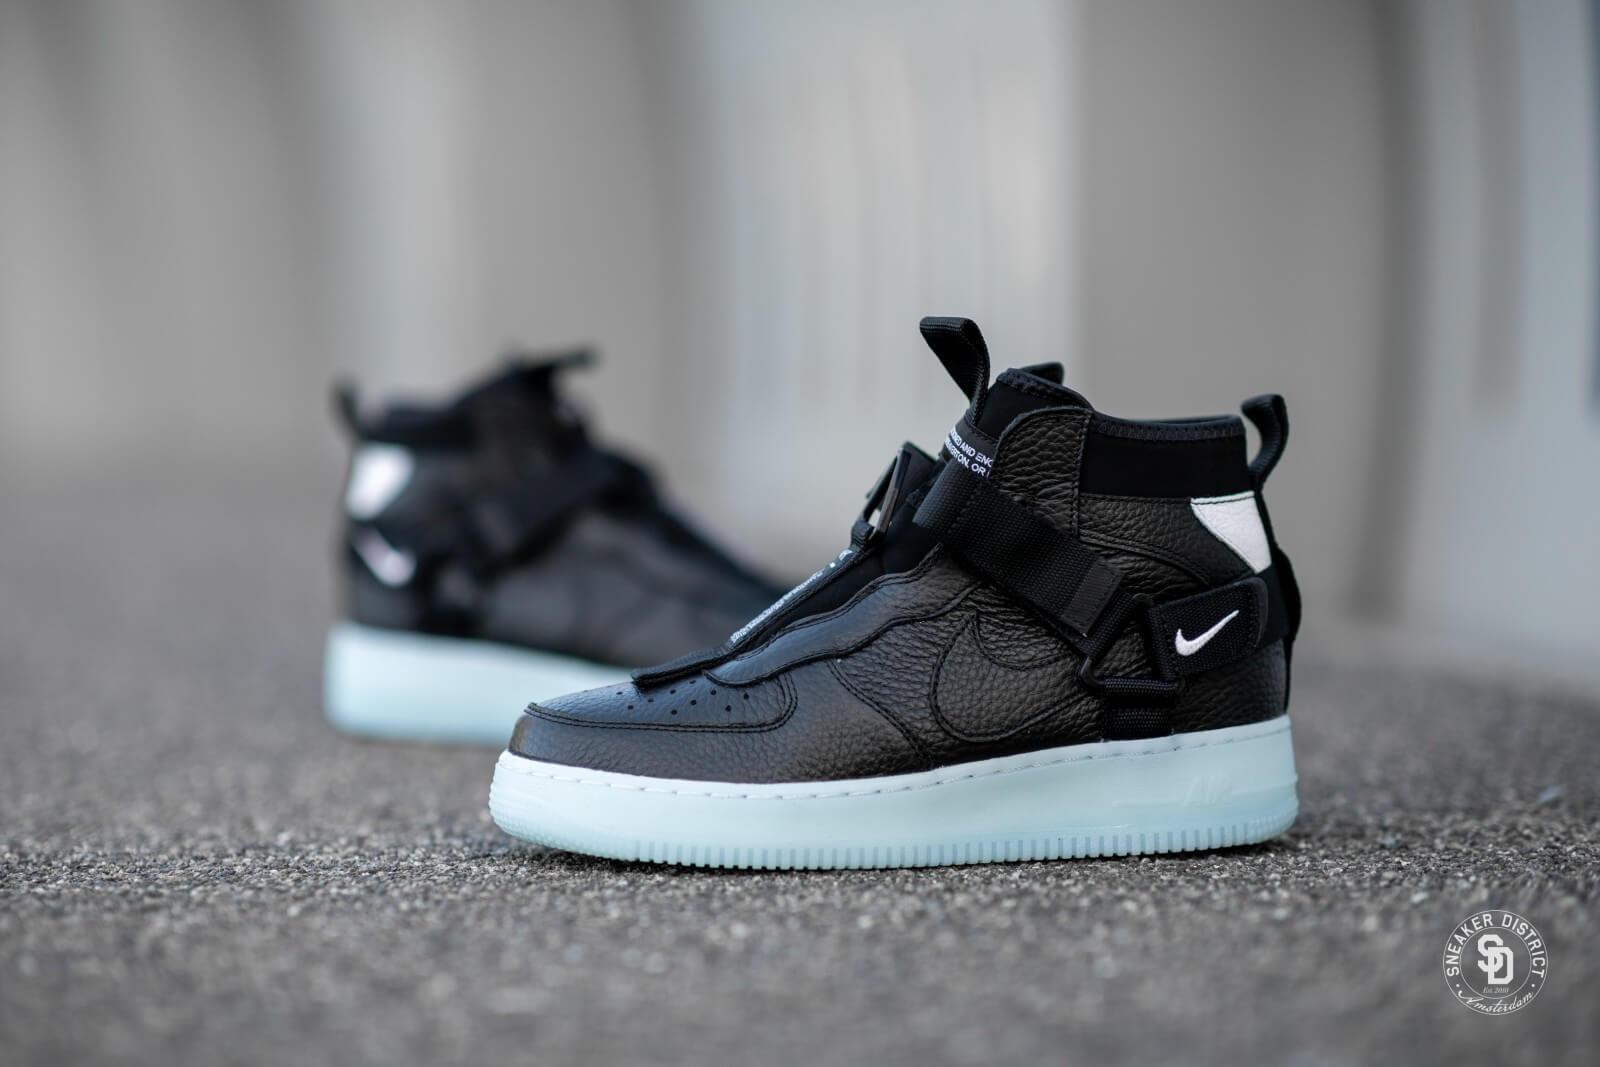 Nike Air Force 1 Utility Mid Black/Half